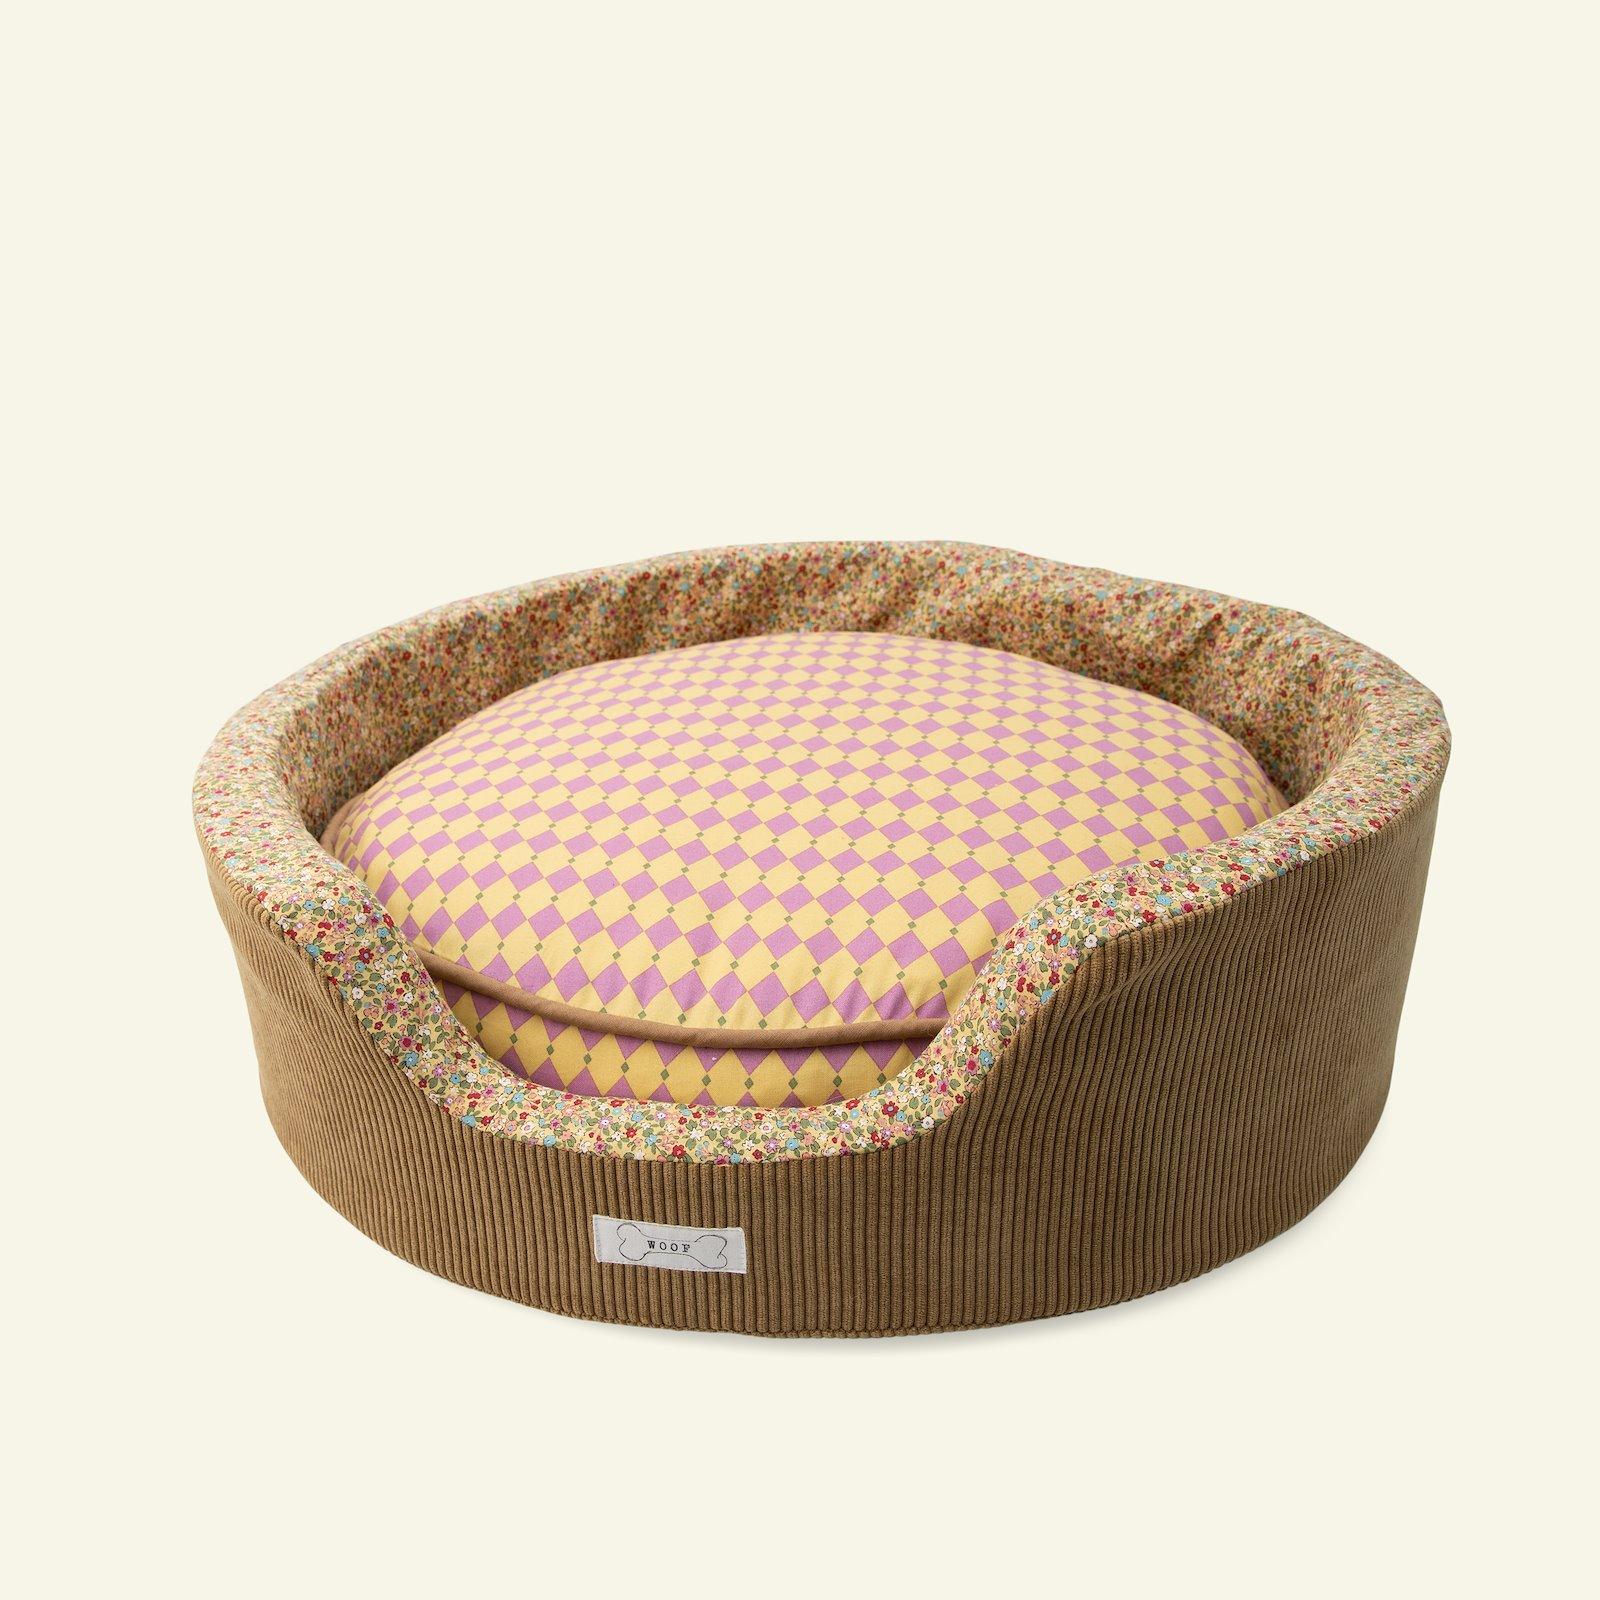 Dog basket p90348_824155_852414_780540_852410_24849_sskit